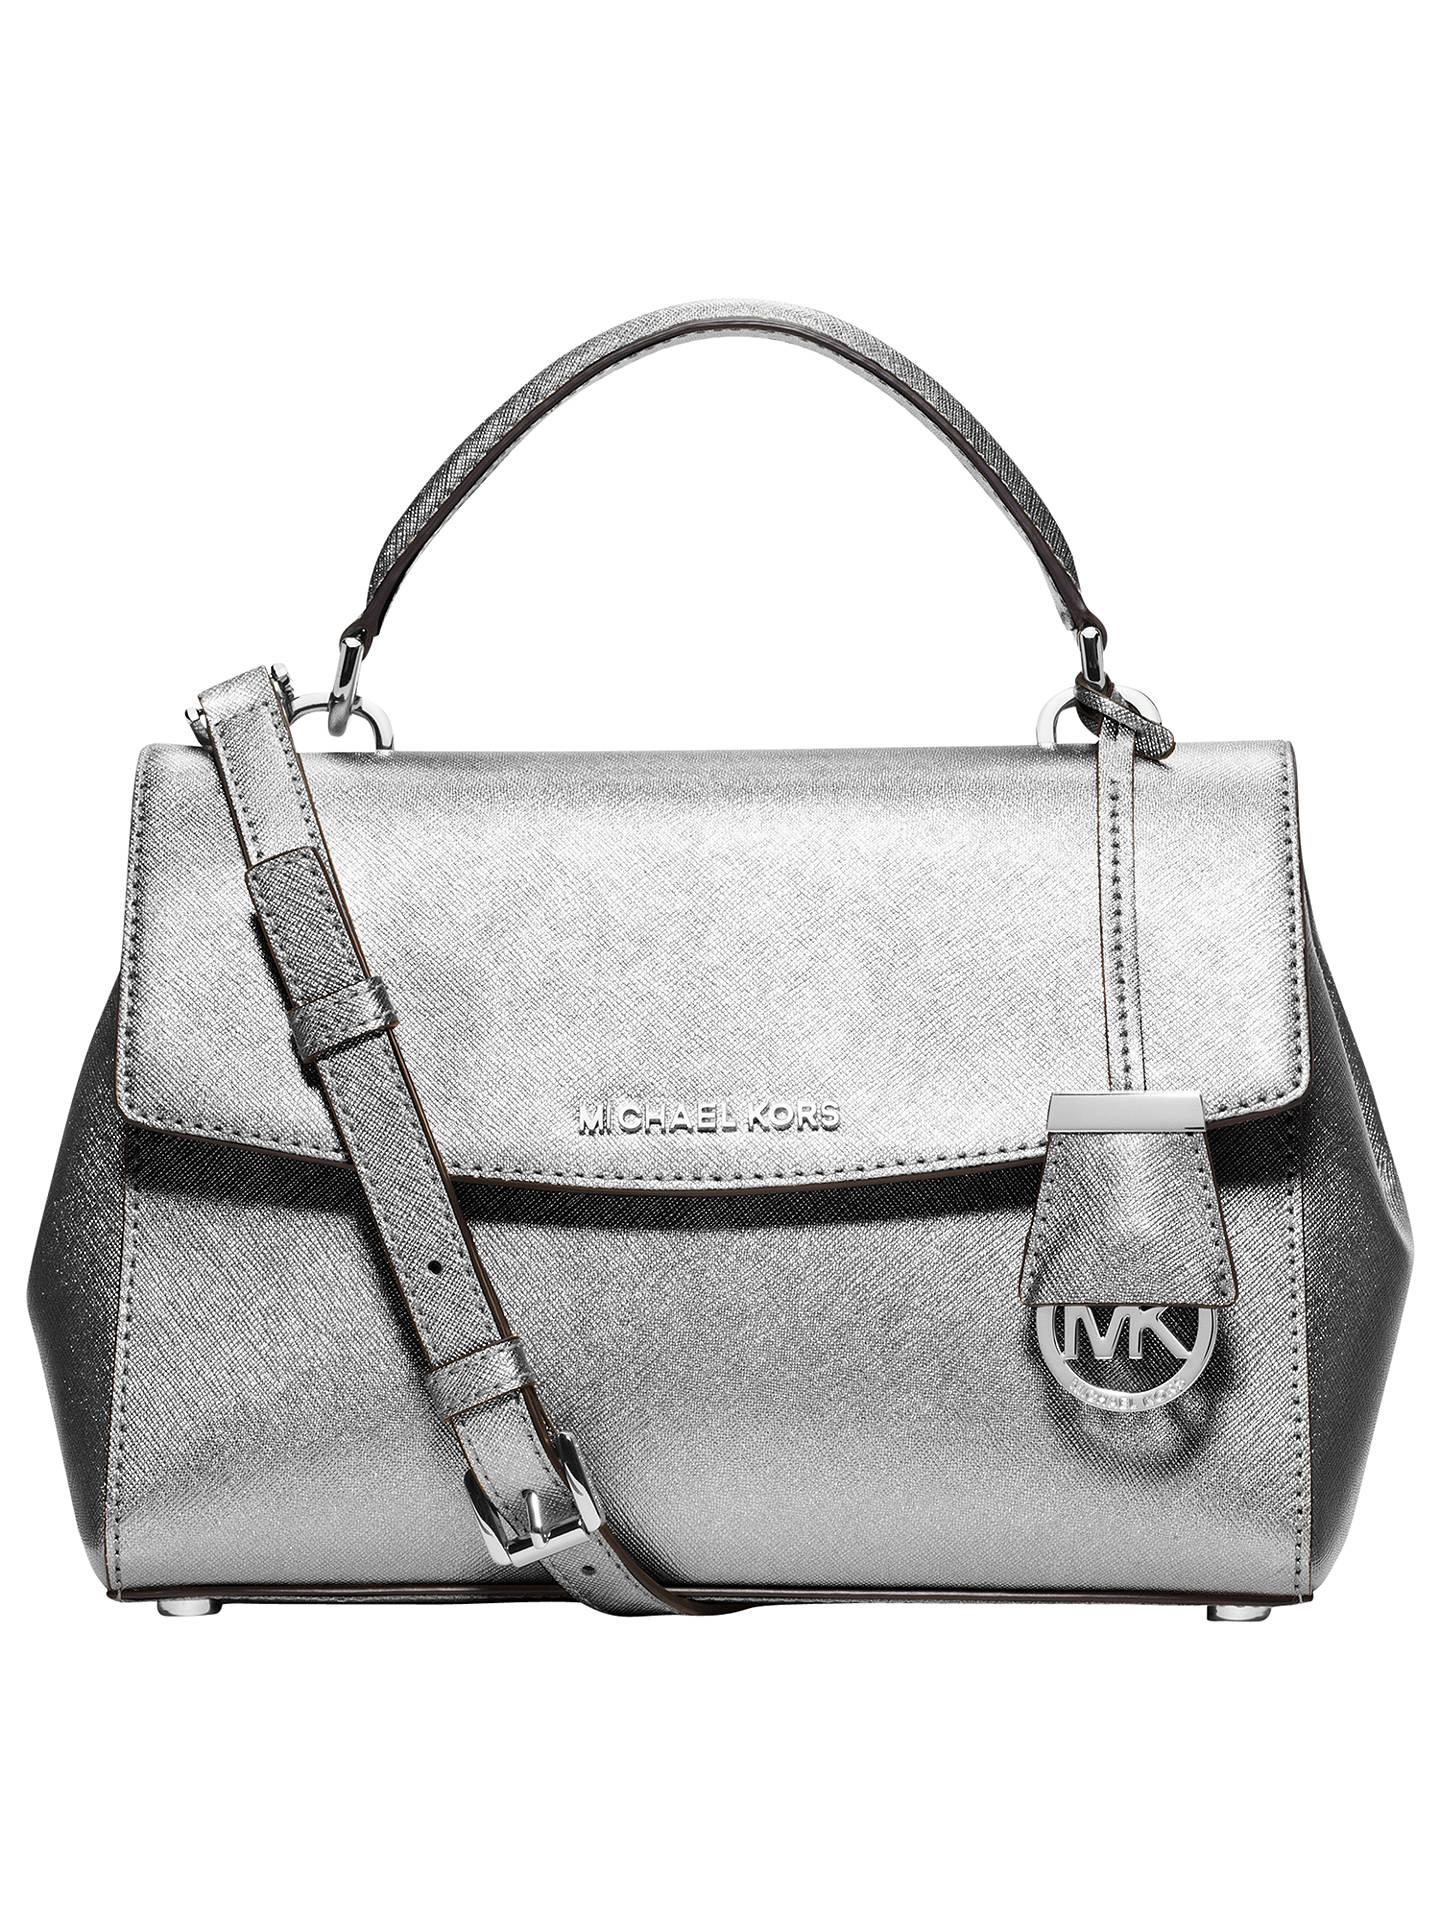 1d5fba7c31c0e2 Buy MICHAEL Michael Kors Ava Small Saffiano Leather Satchel, Silver Online  at johnlewis.com ...